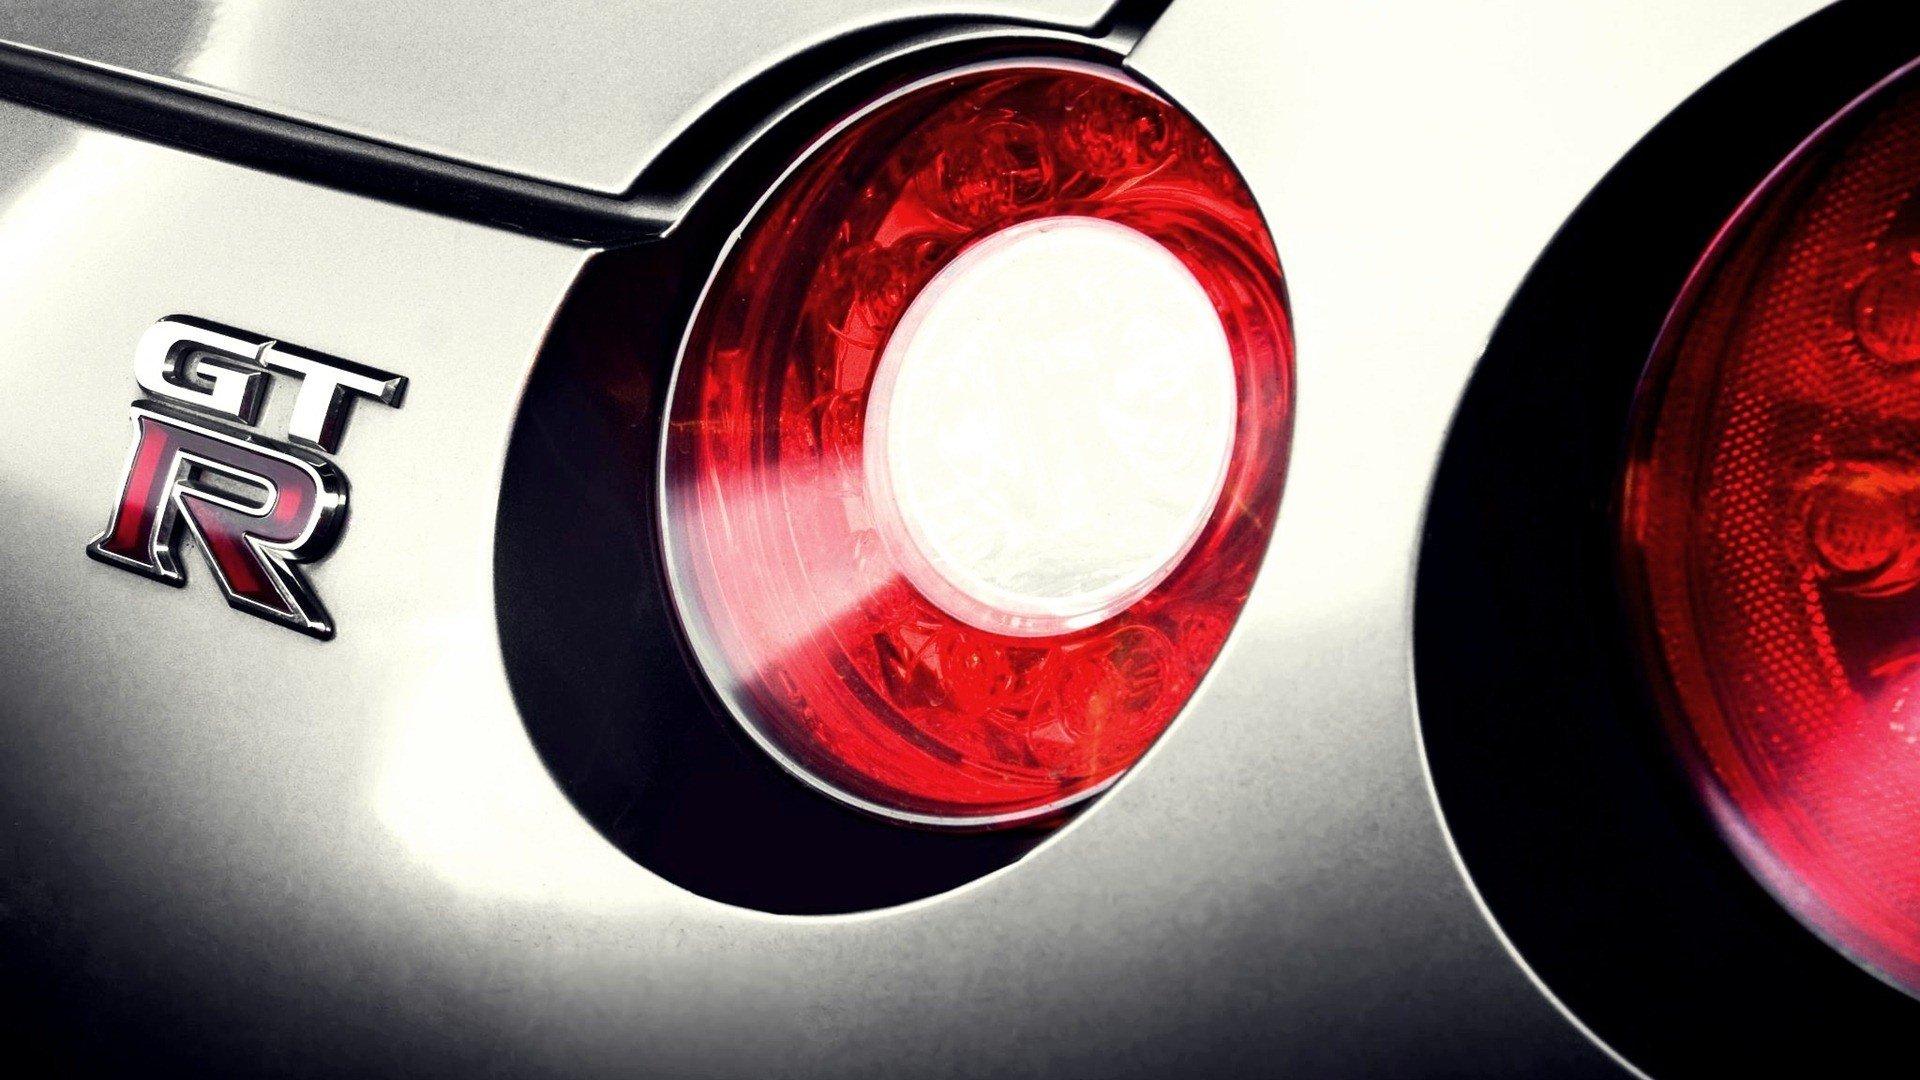 Nissan GTR Nissan R35 GT R taillights Nissan GTR gtr logo wallpaper 1920x1080